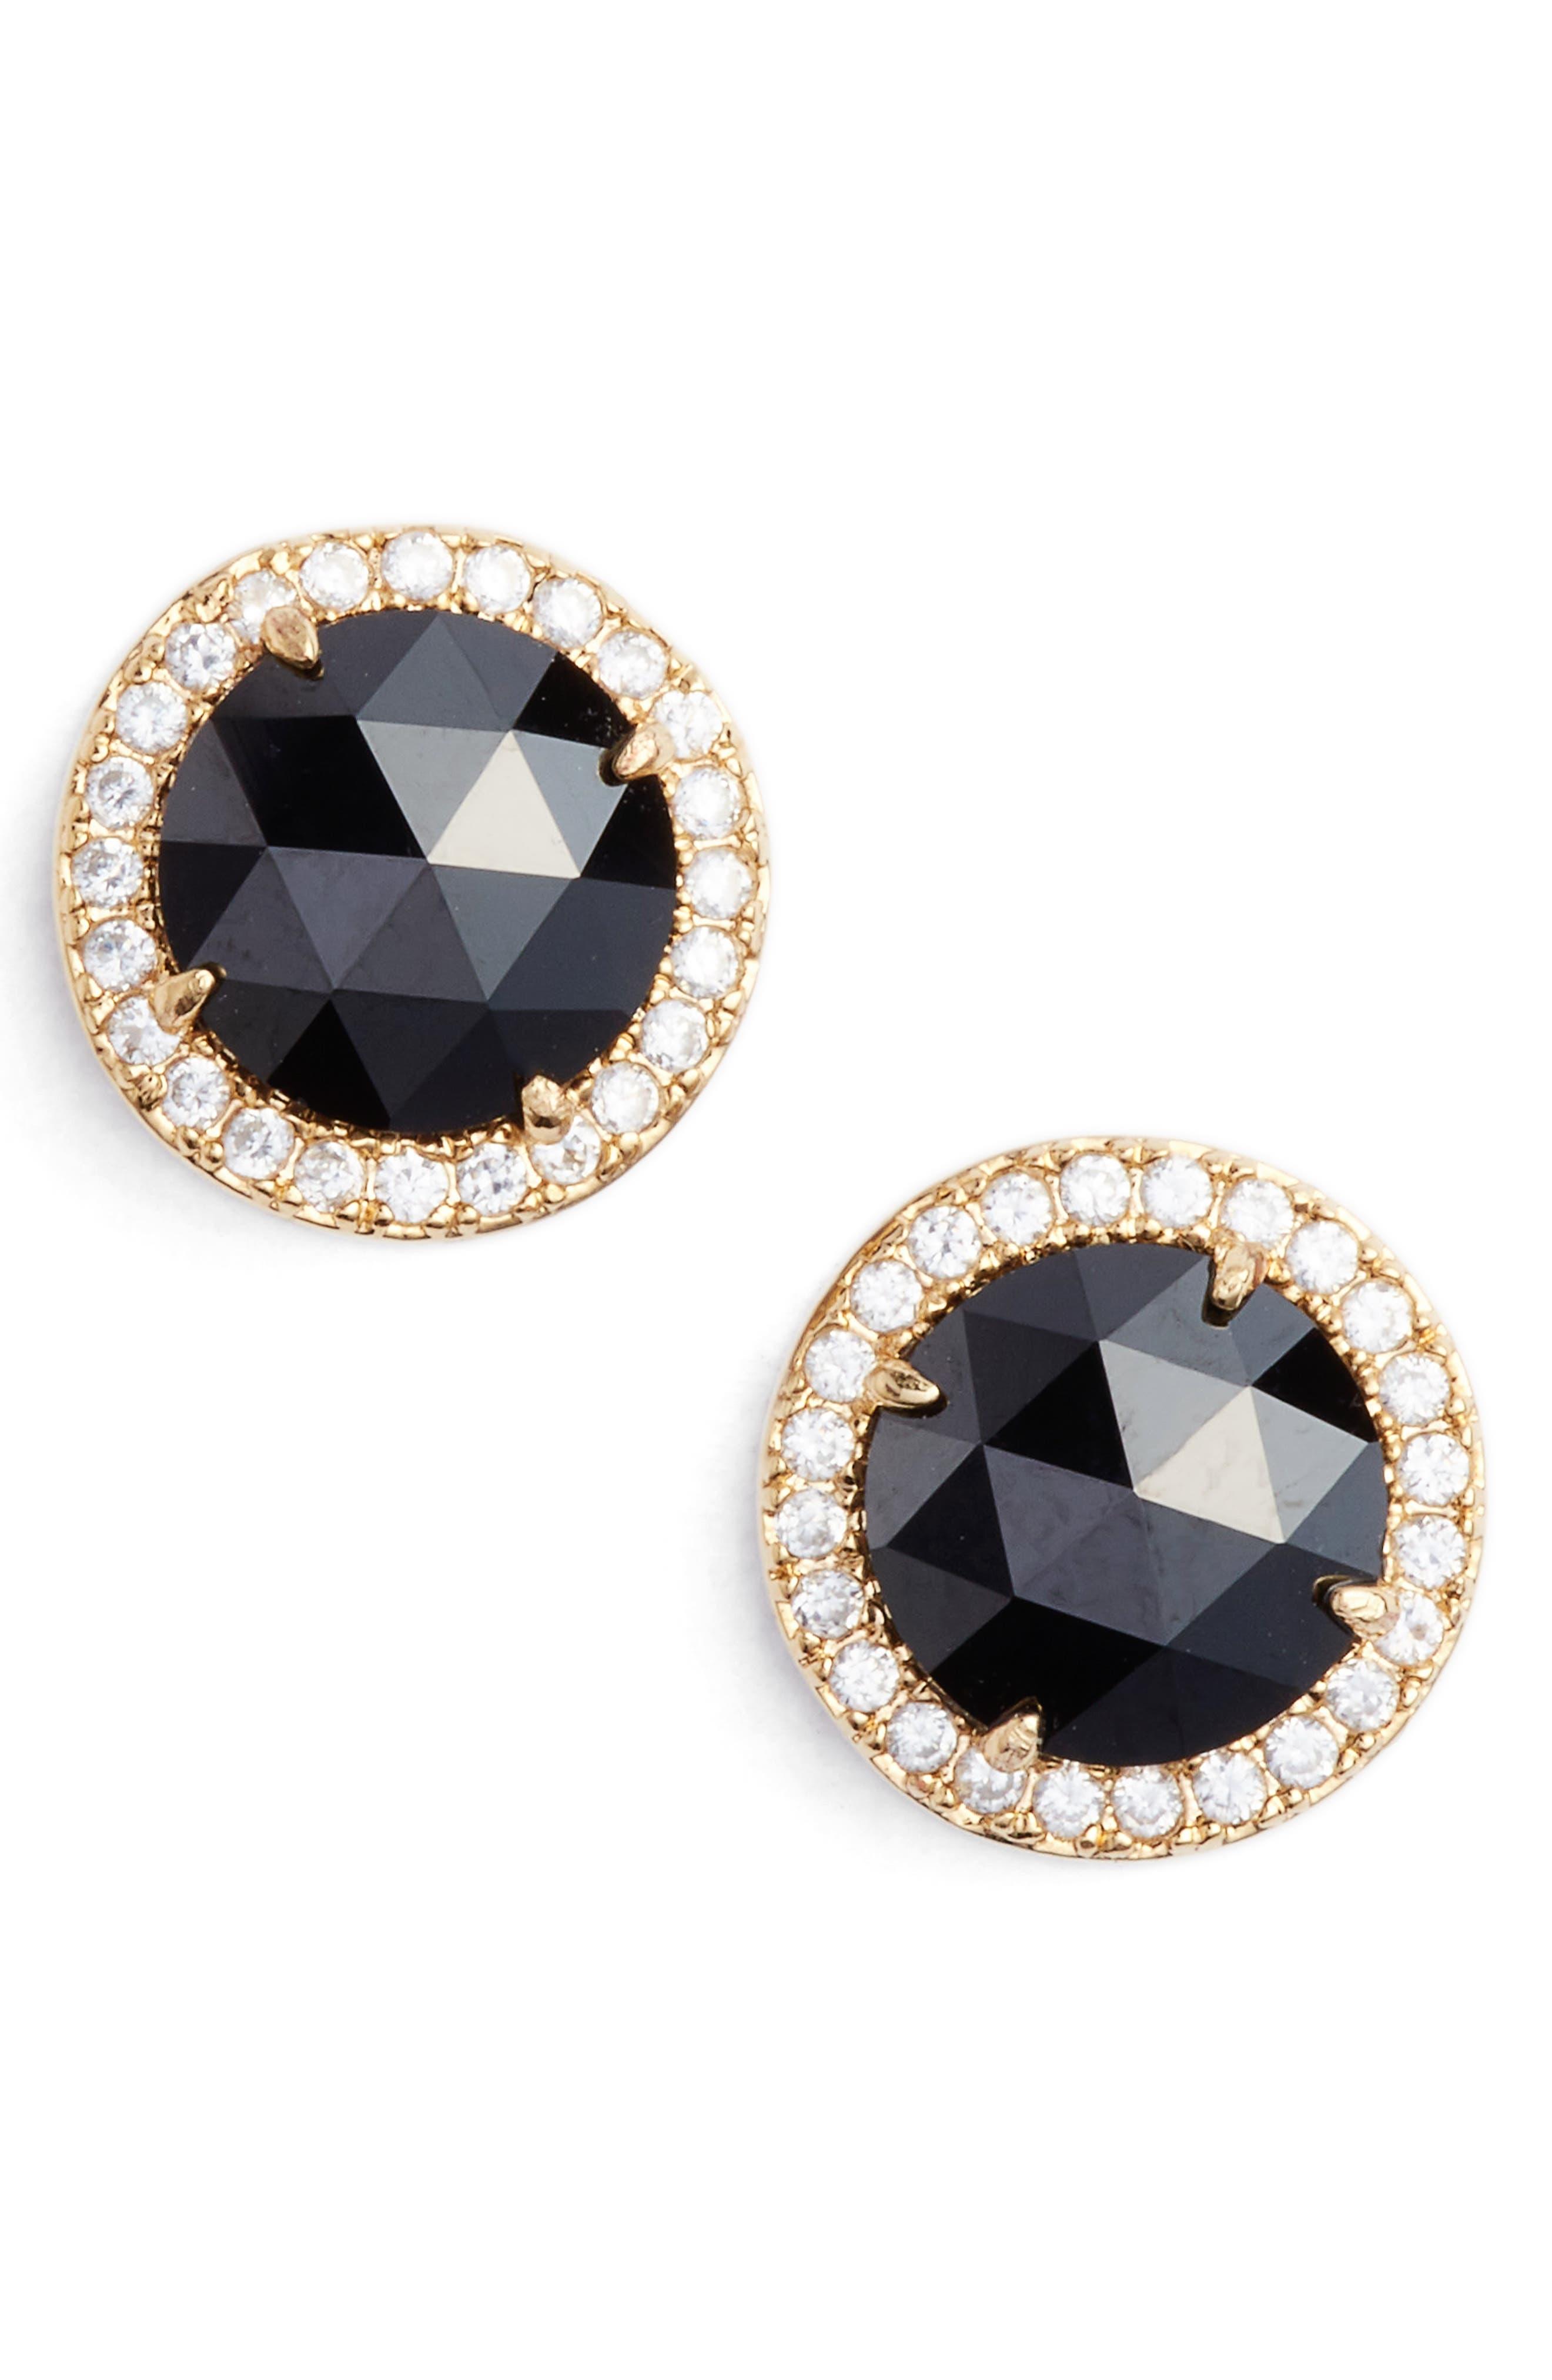 KATE SPADE NEW YORK, bright ideas pavé halo stud earrings, Main thumbnail 1, color, JET